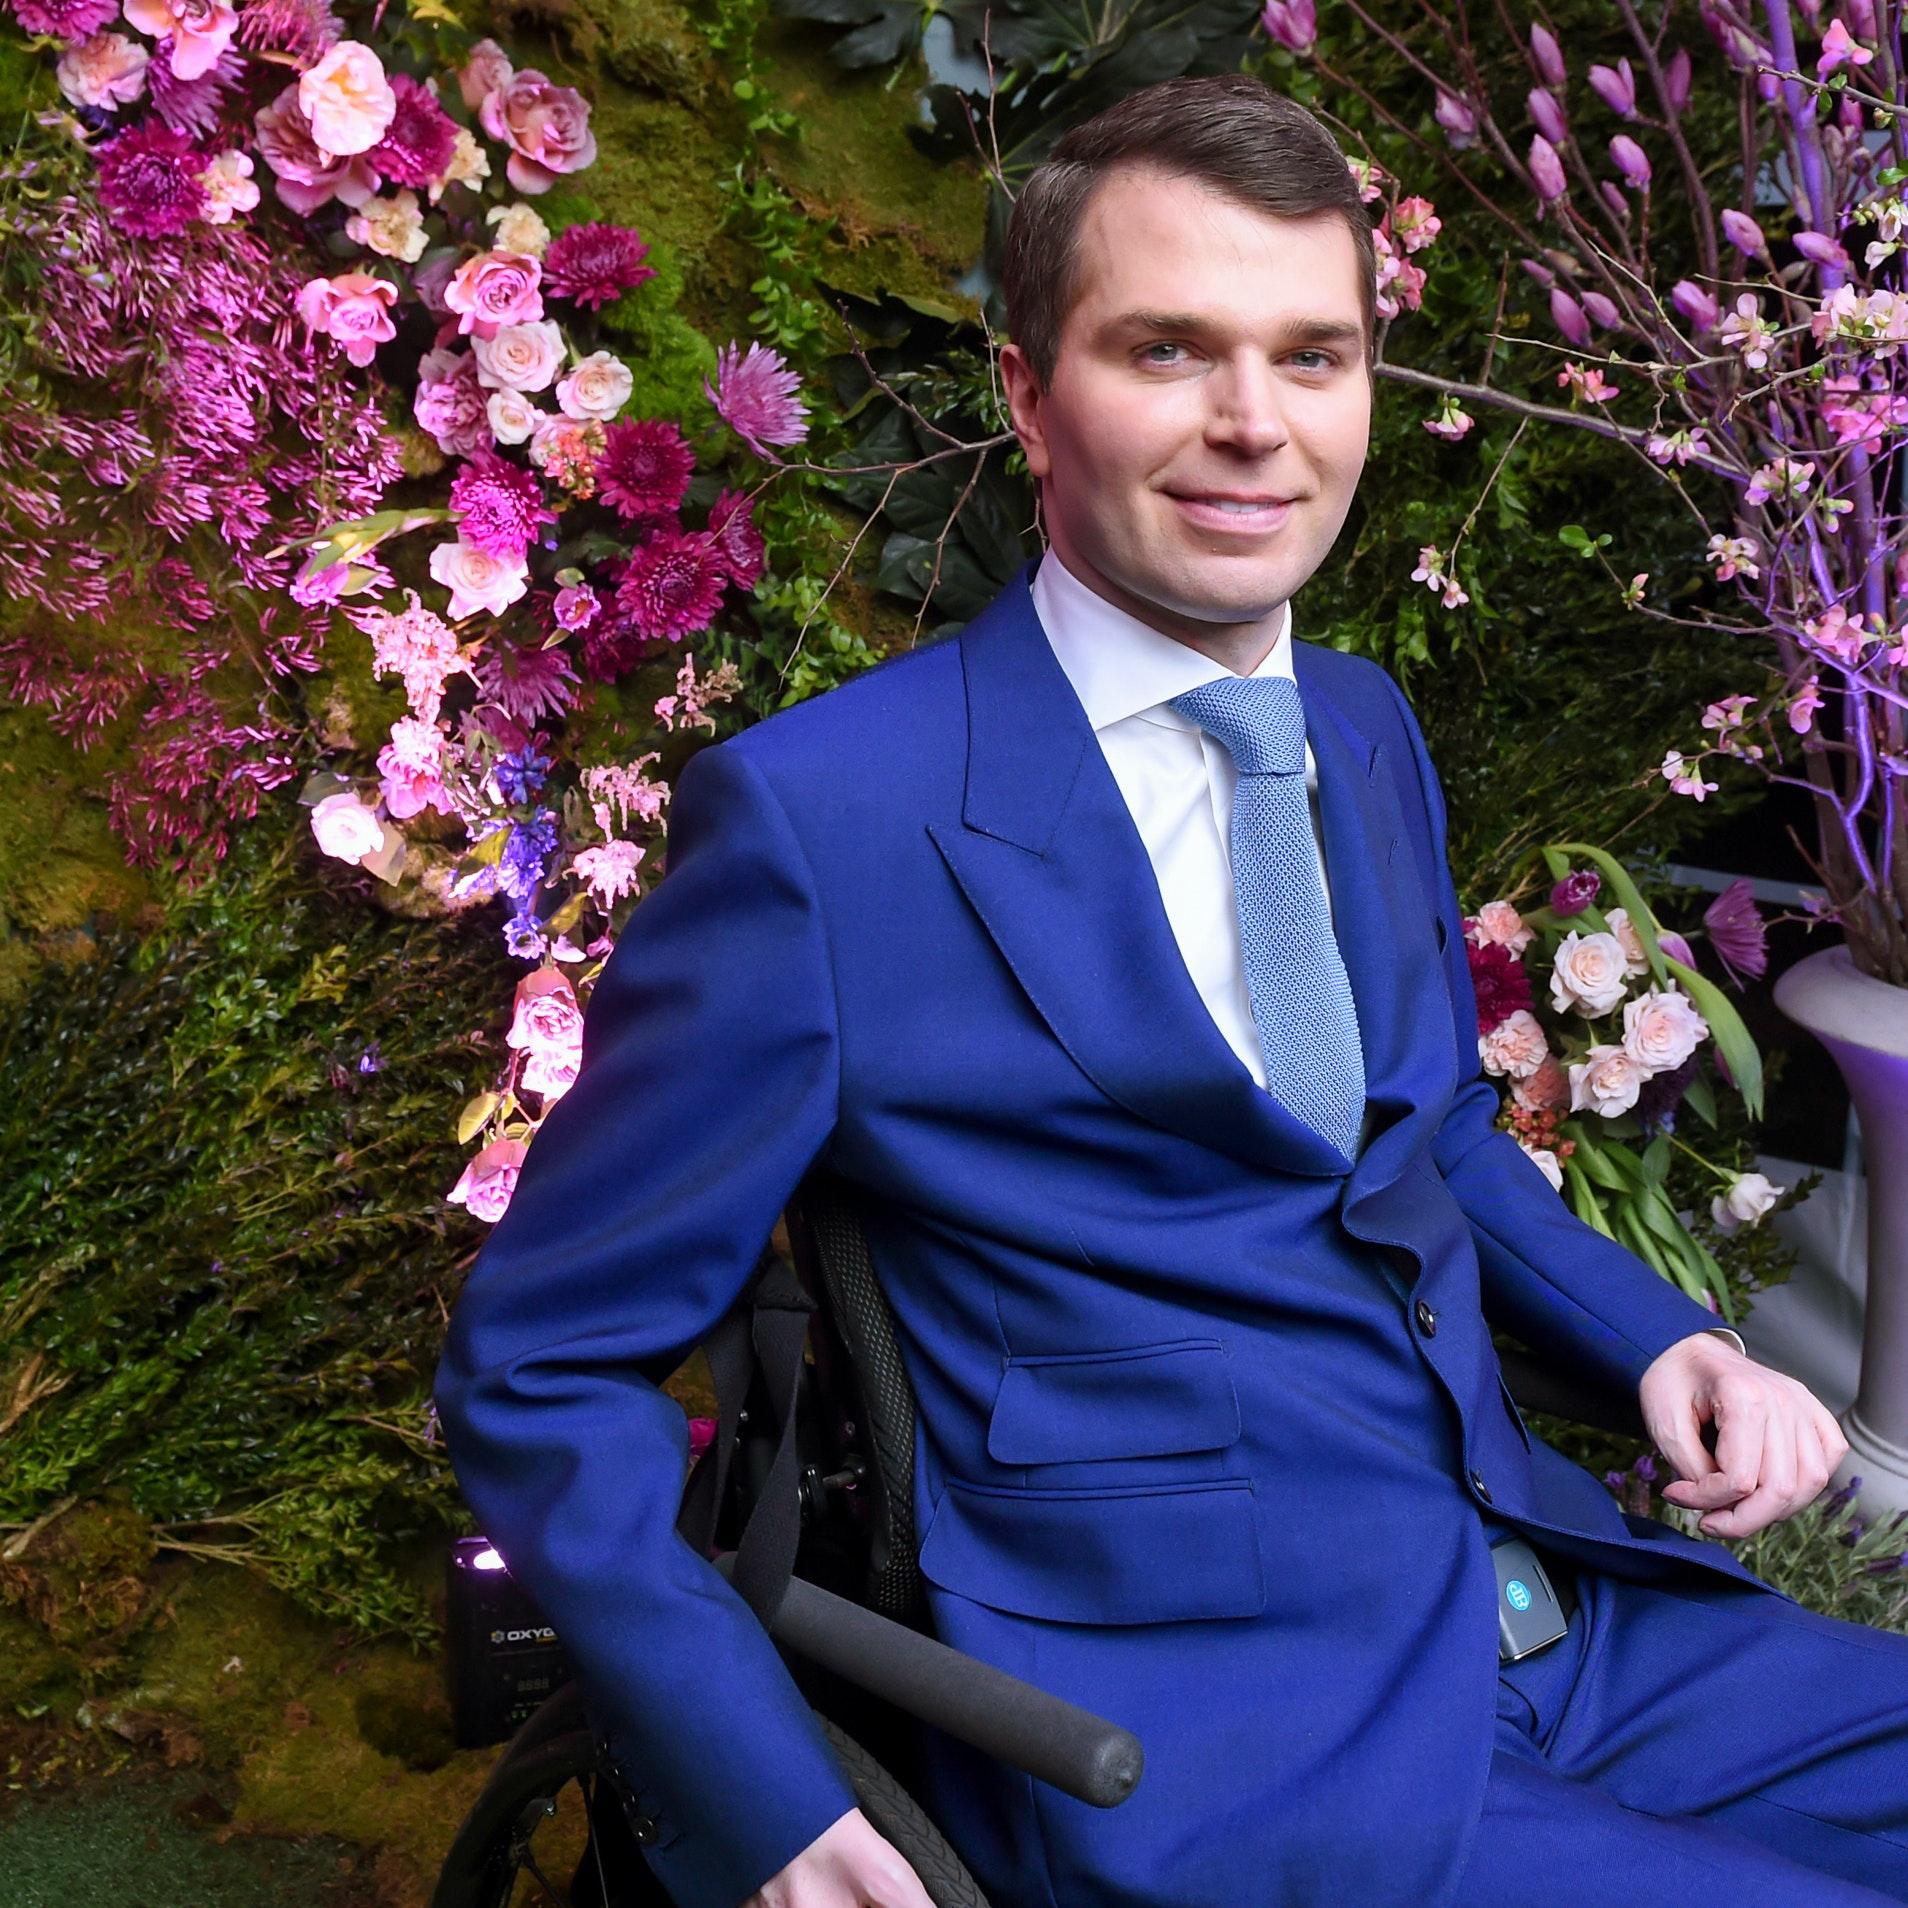 Clark's Botanicals Founder and CEO Francesco Clark on Multitasking, Meditation, and More